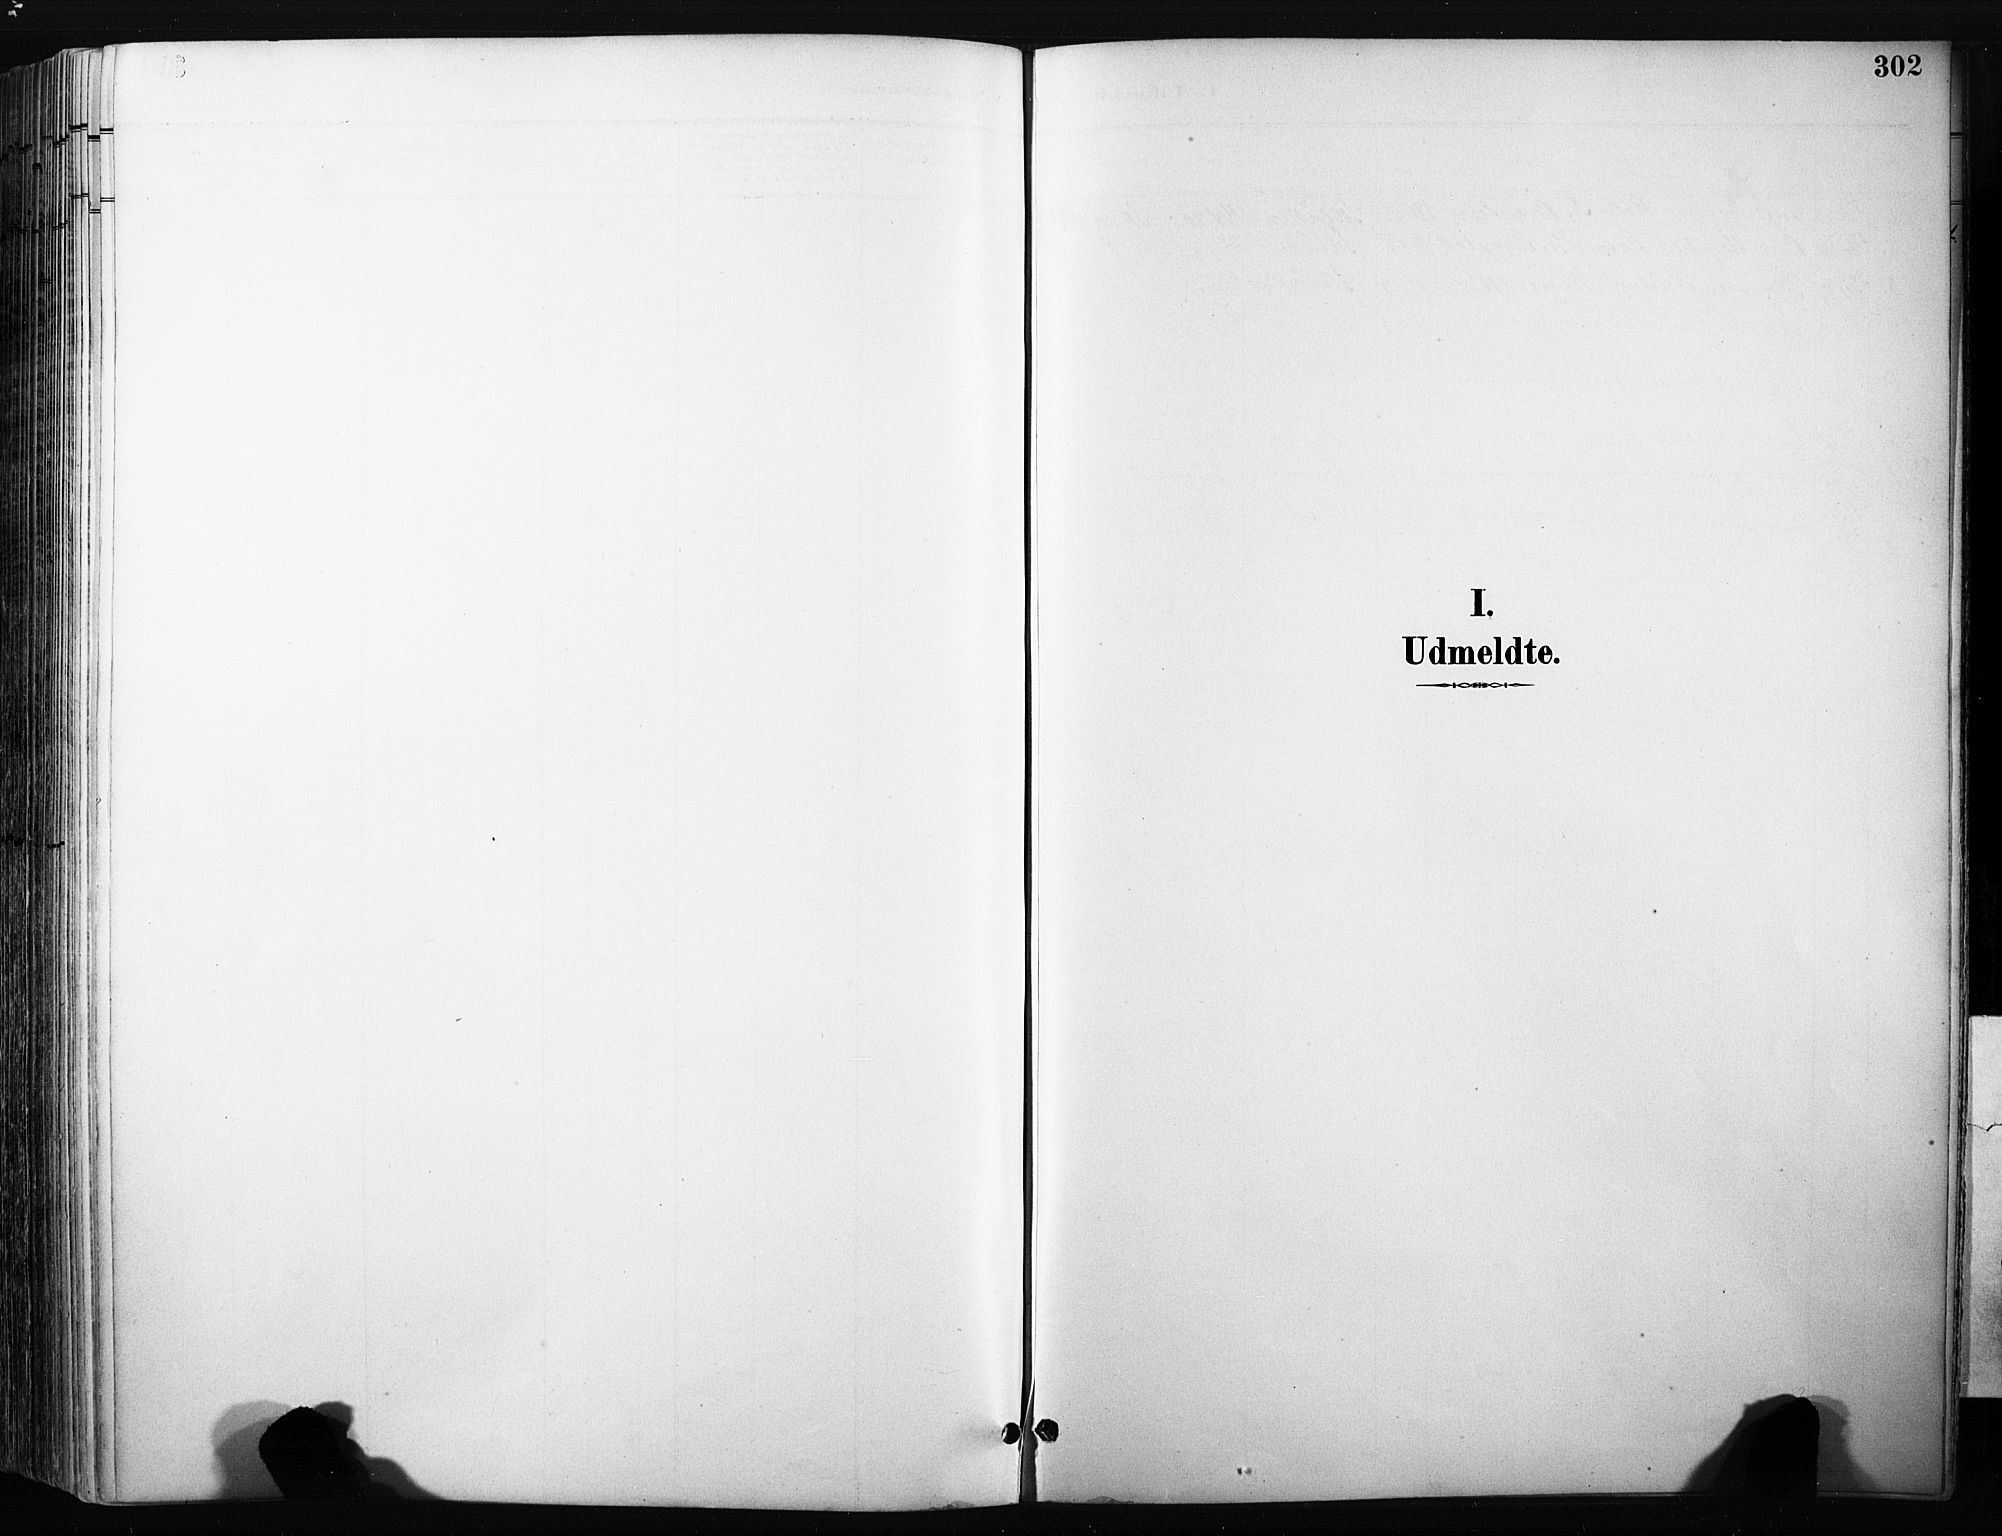 SAH, Skjåk prestekontor, Klokkerbok nr. 3, 1893-1932, s. 302